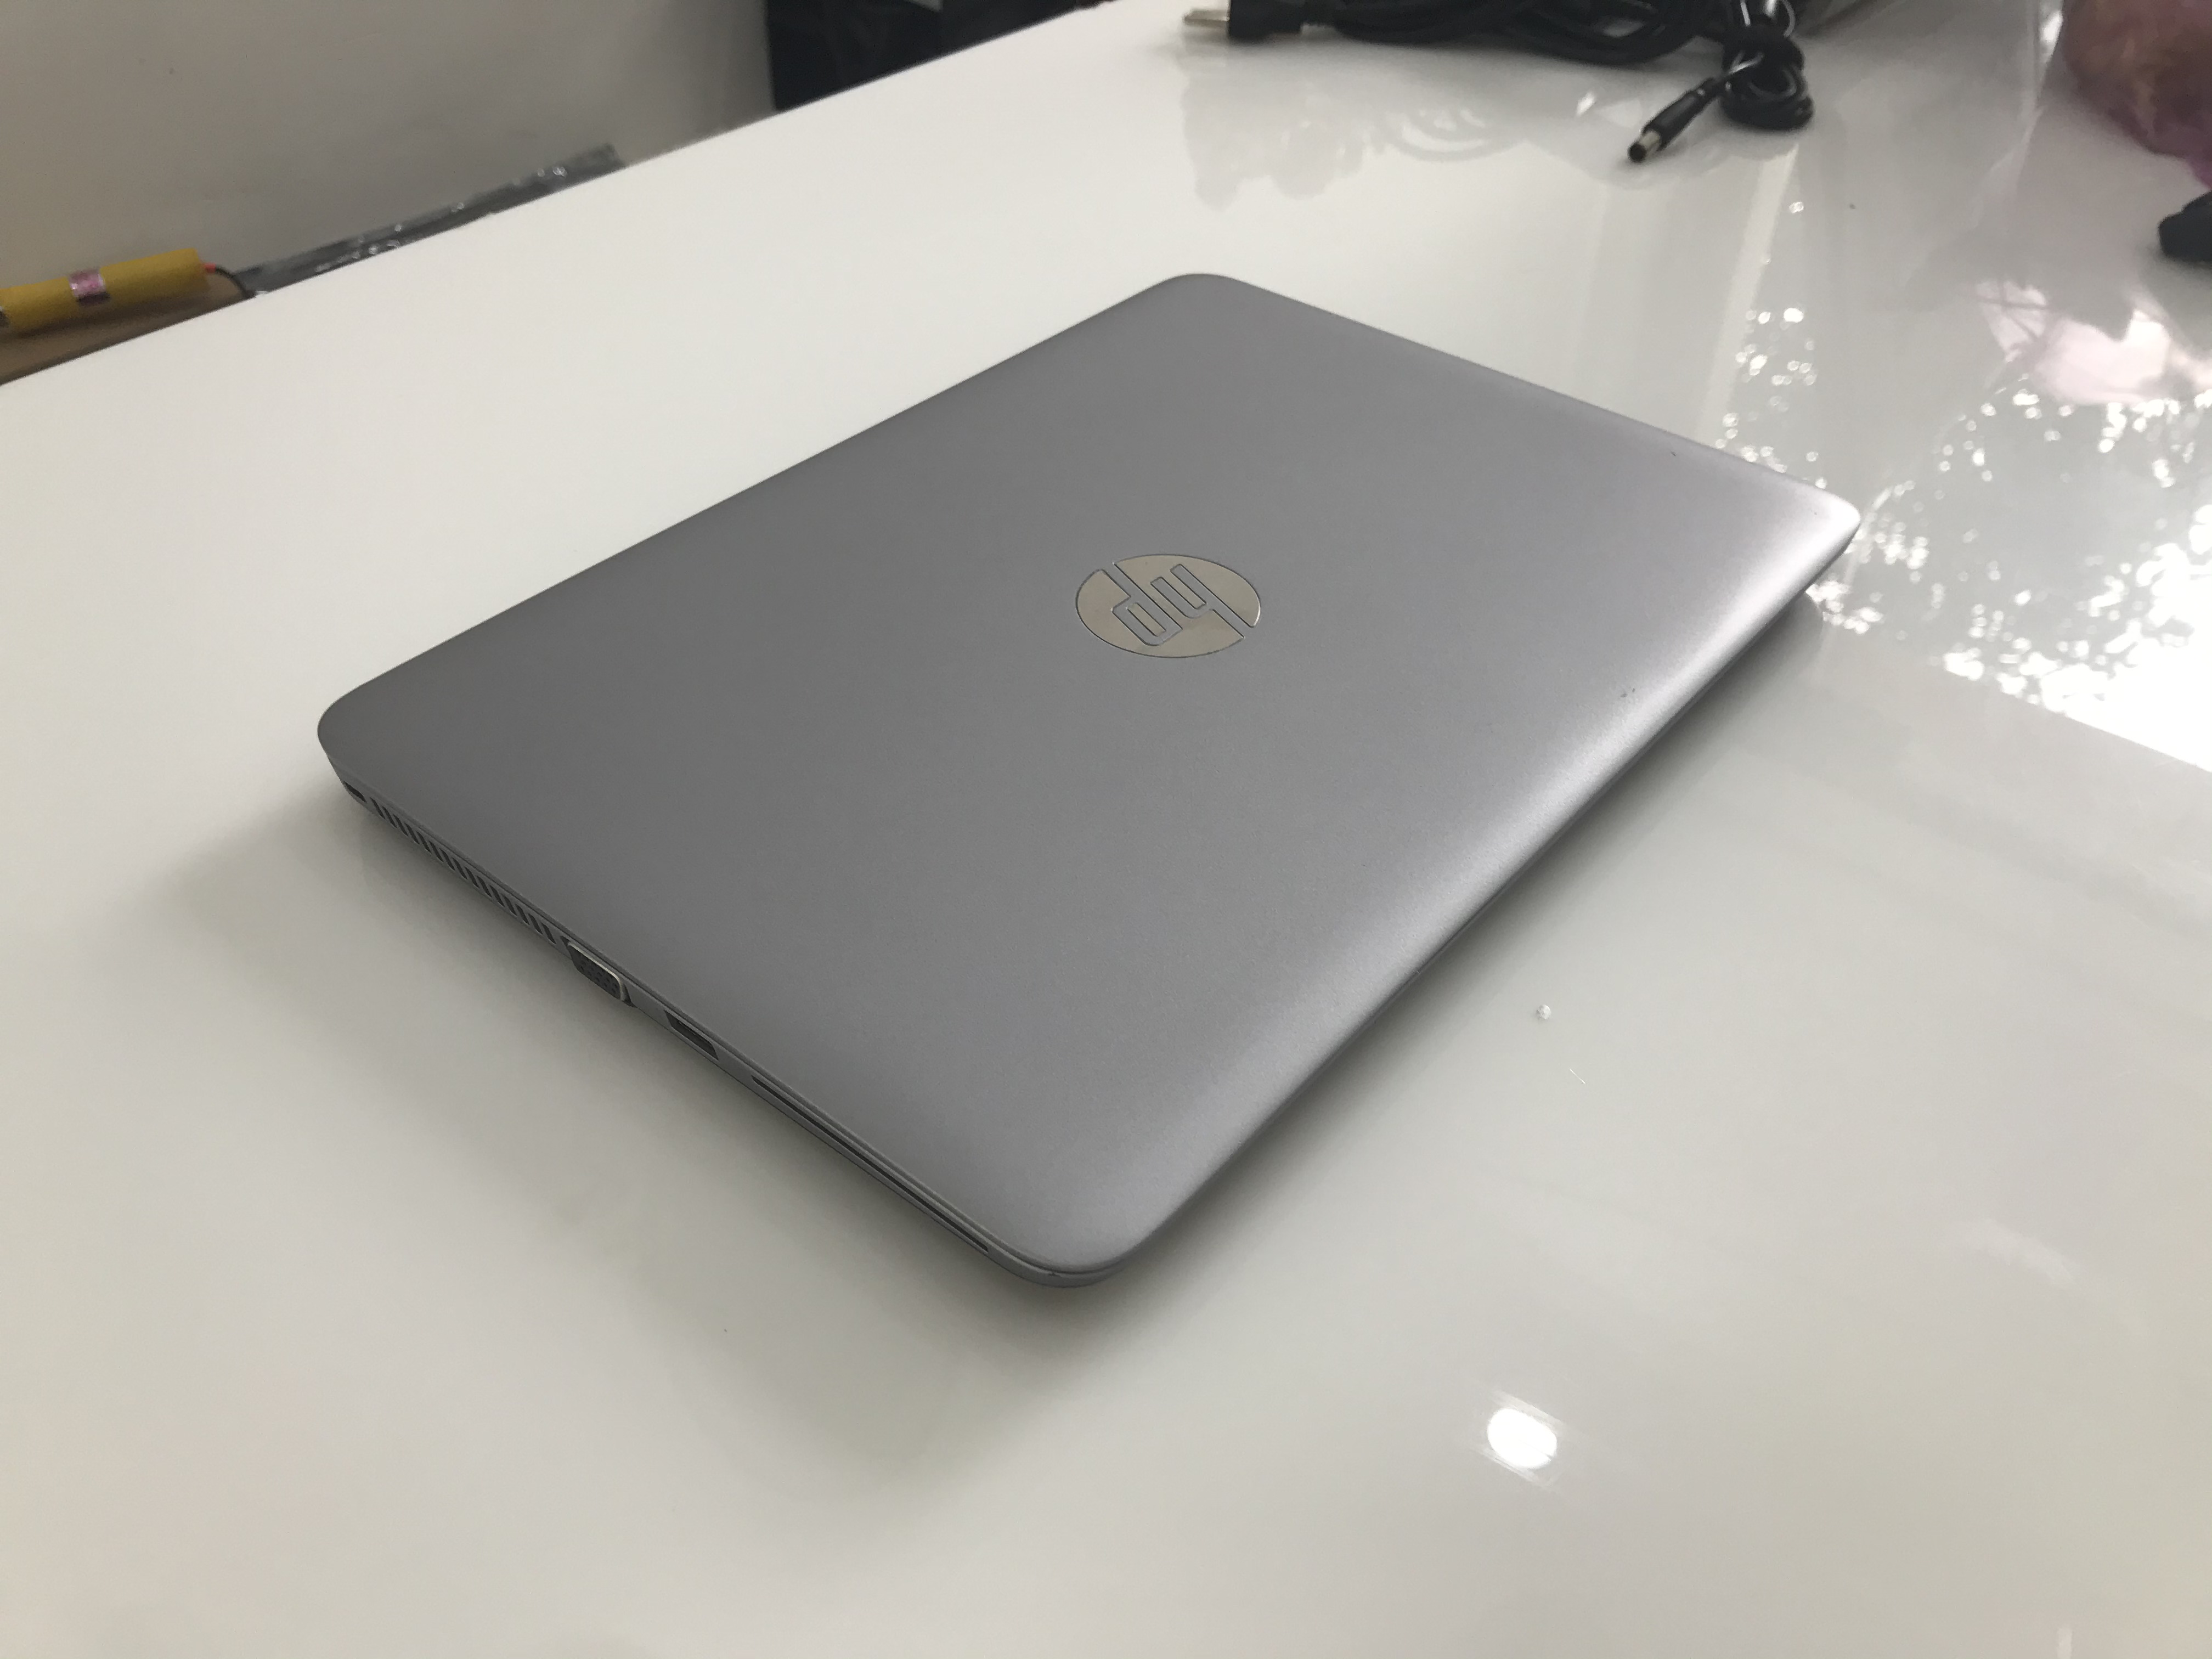 hp 820g3 laptopnhap (1)